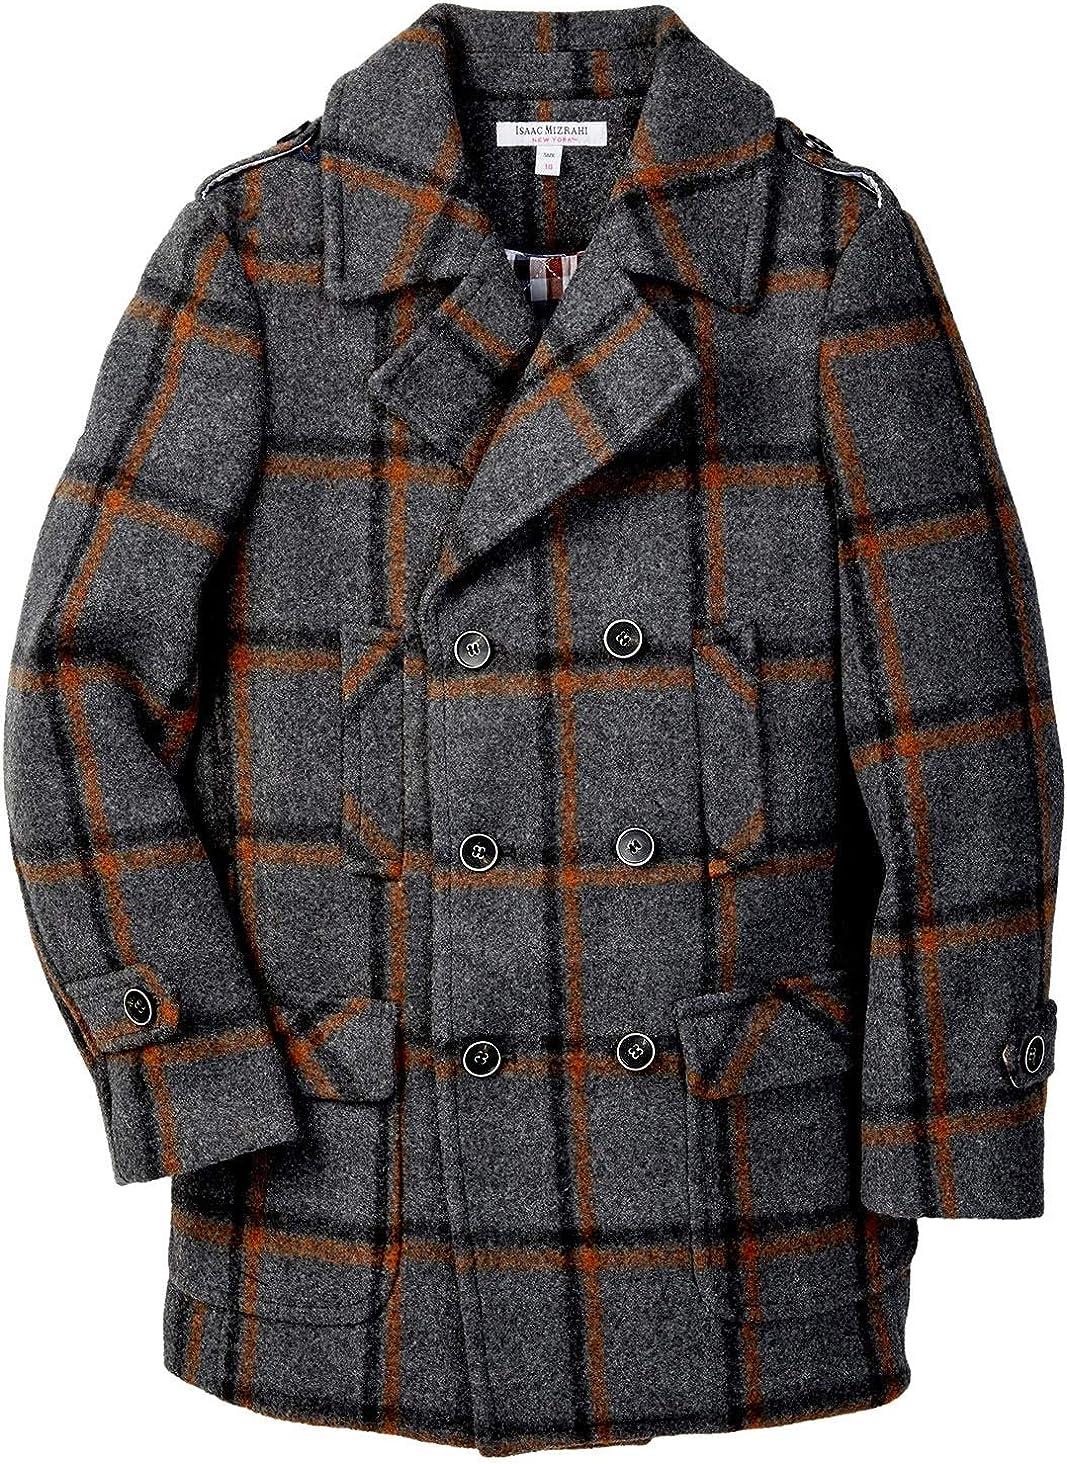 Isaac Mizrahi Boy/'s 2-20 Multi Plaid Double Breasted Wool Pea Coat